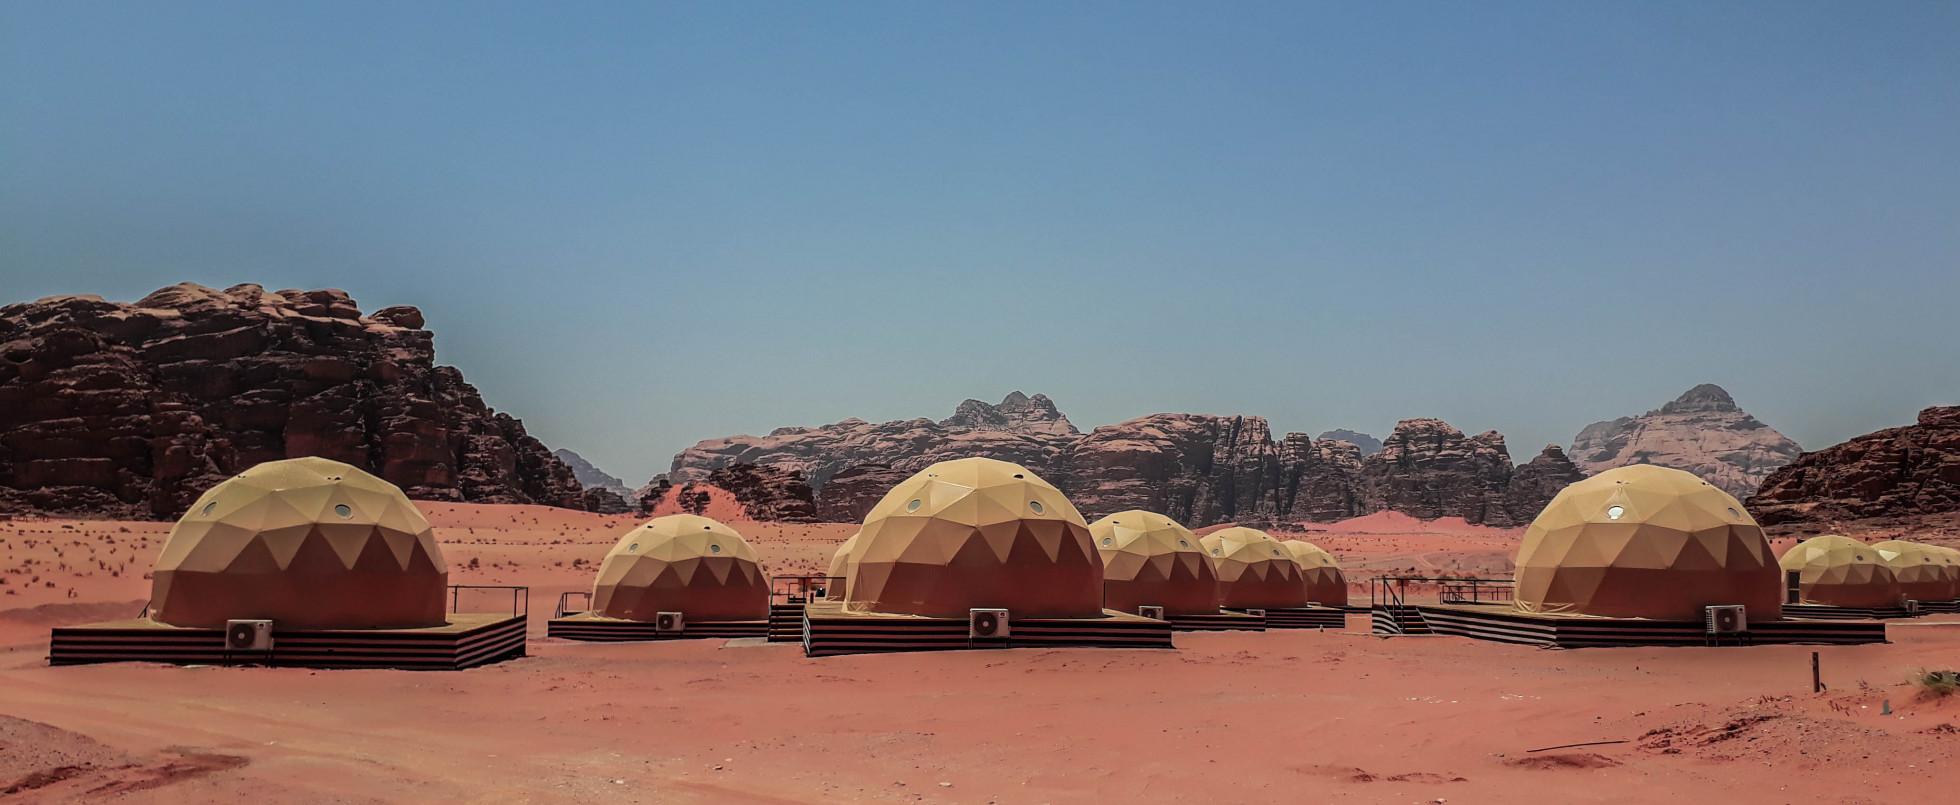 A Sleepover on Mars